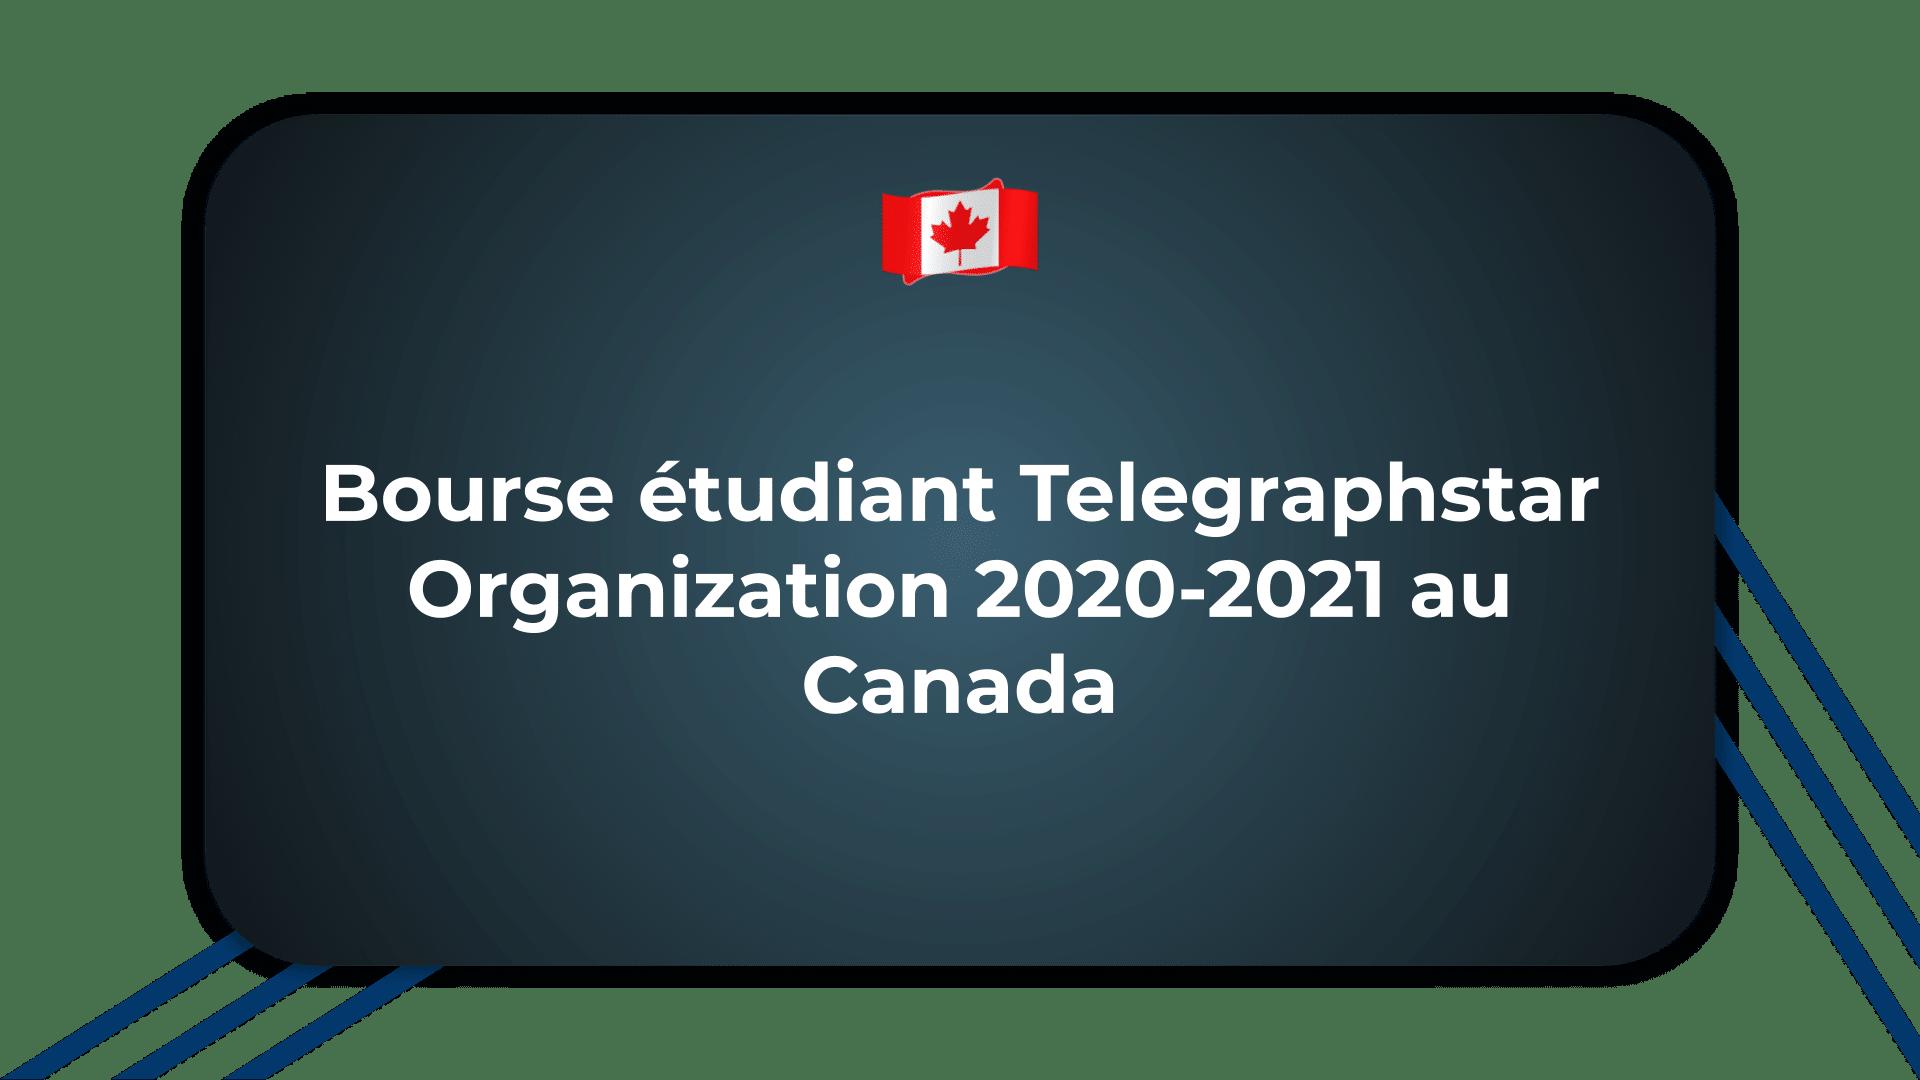 Bourse étudiant Telegraphstar Organization